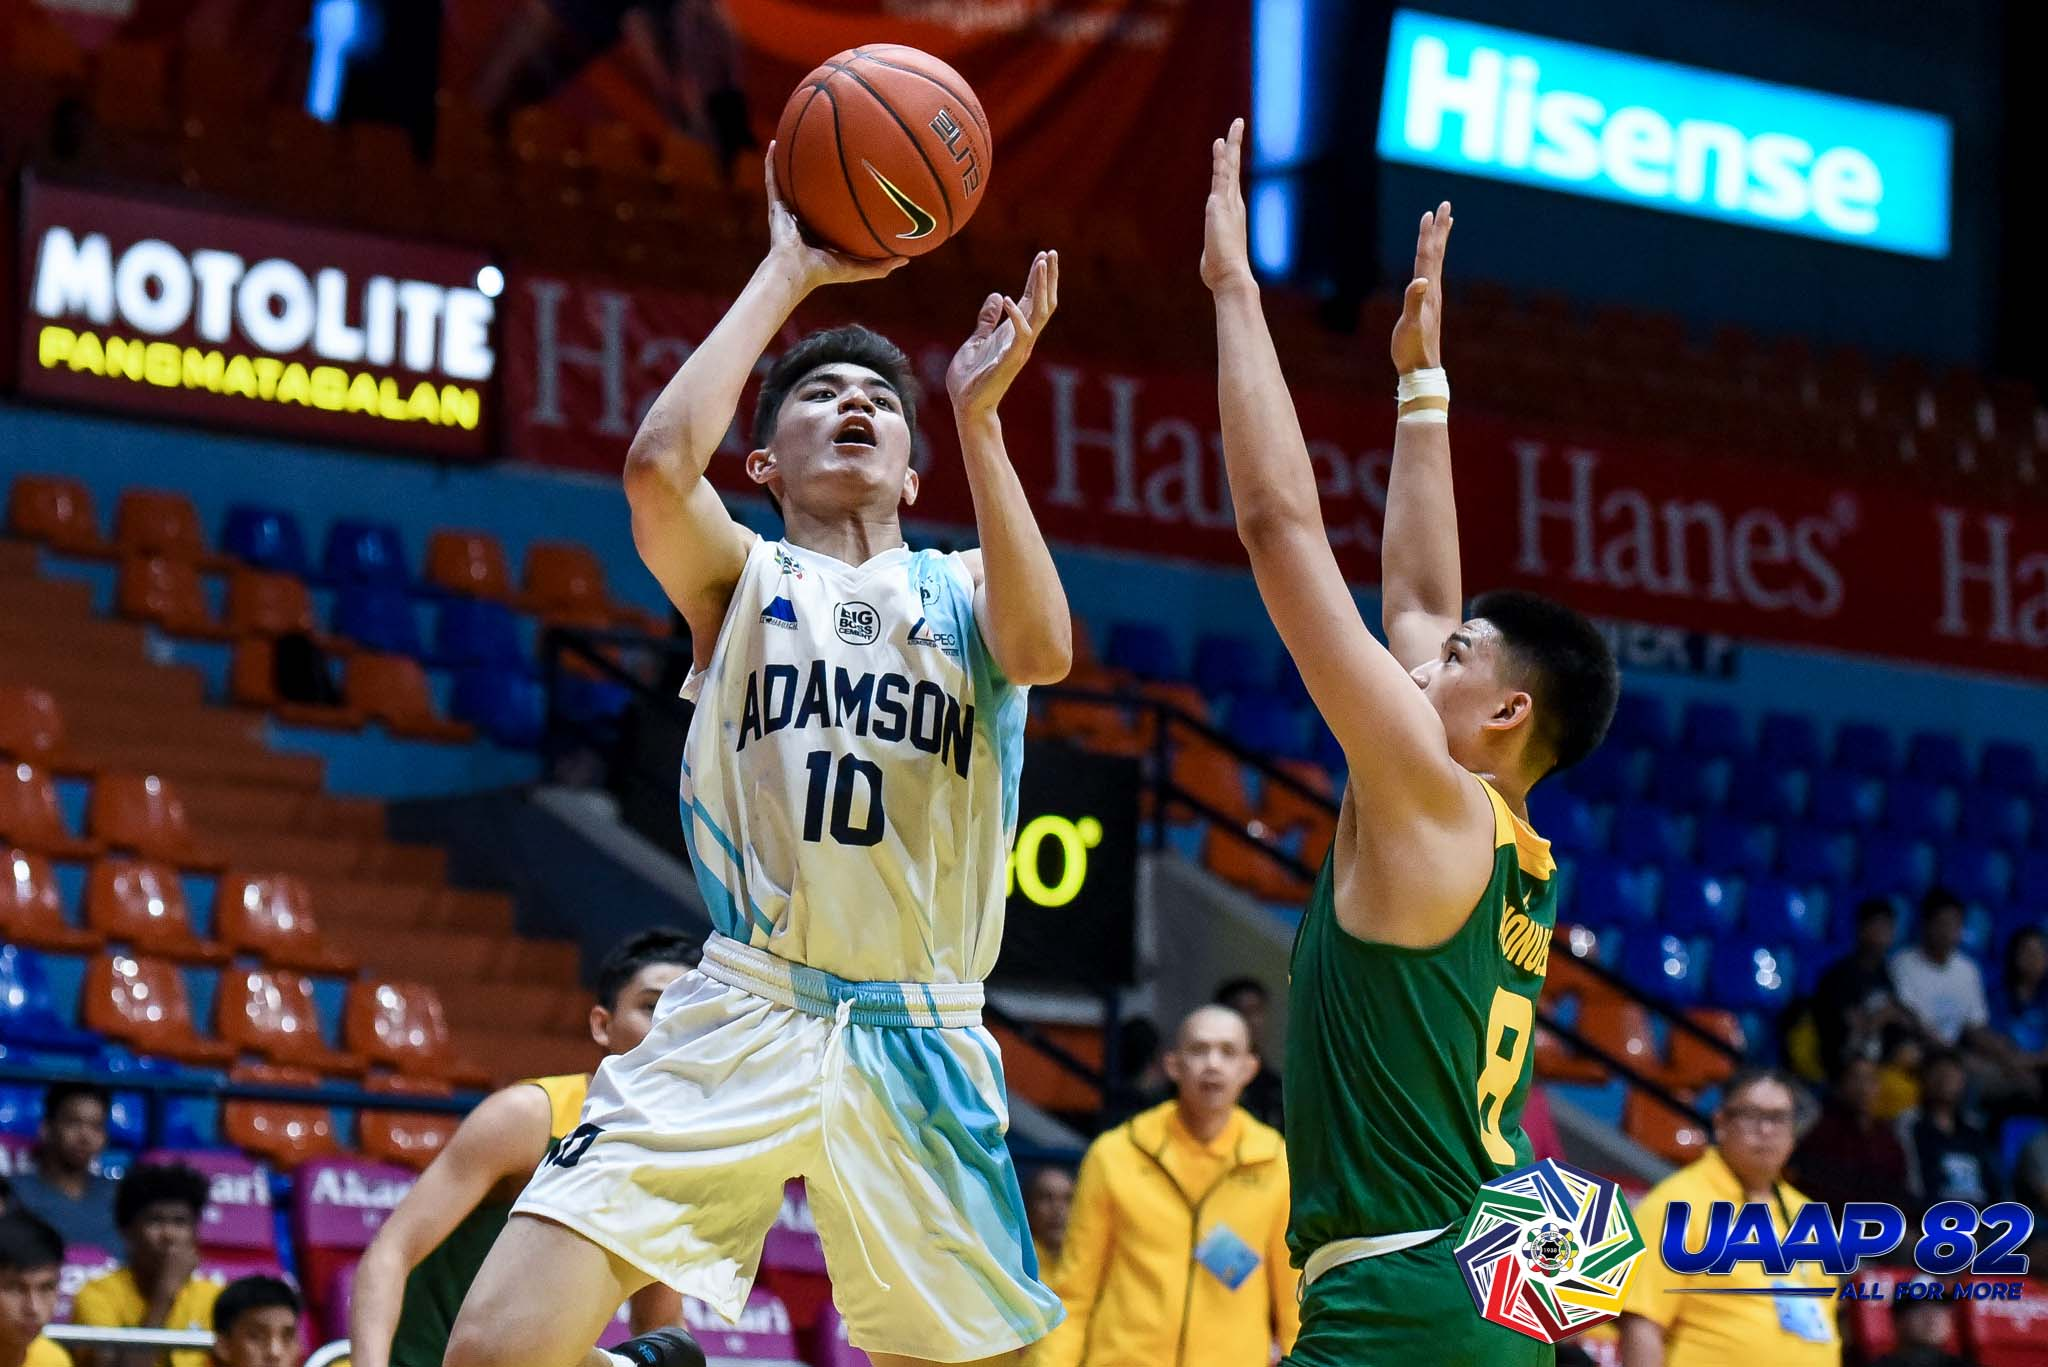 UAAP82-JRS-BASKETBALL-4TH-PHOTO-ADU-BARCELONA Matty Erolon, Joshua Barcelona to remain with Adamson AdU Basketball News UAAP  - philippine sports news